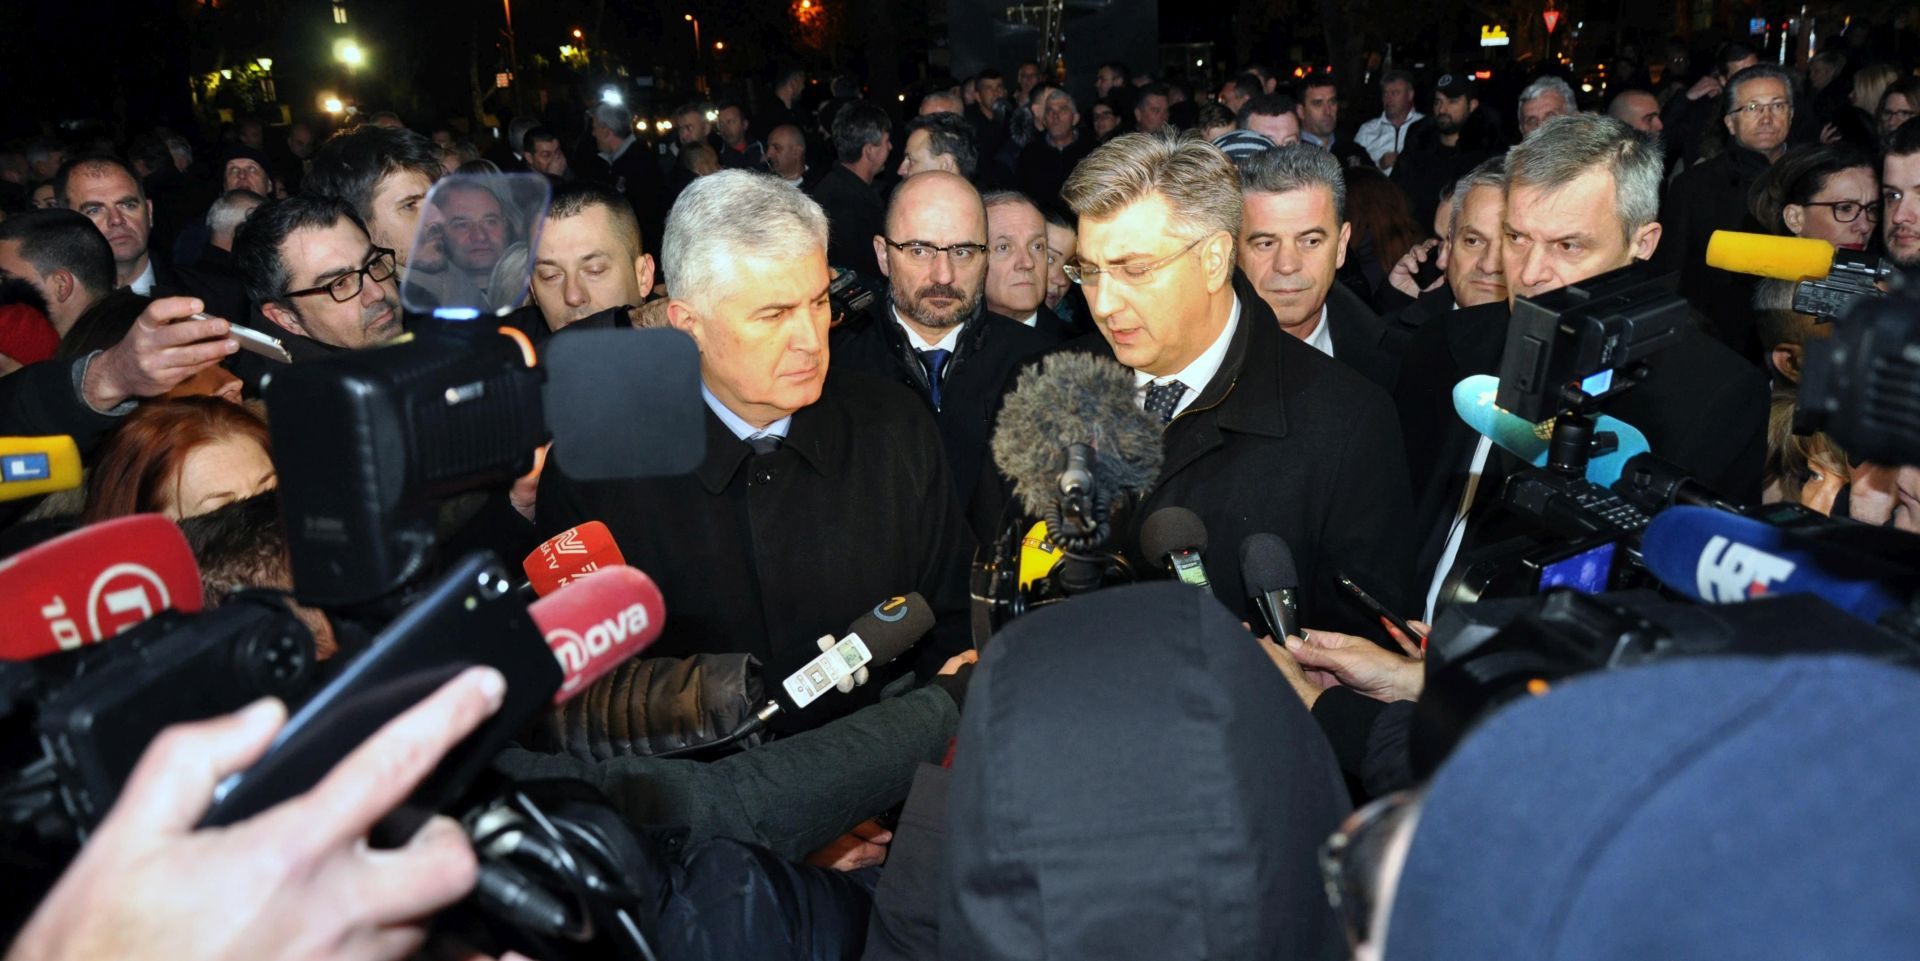 PLENKOVIĆ U MOSTARU Čović dočekao premijera ispred HDZ-a u Mostaru